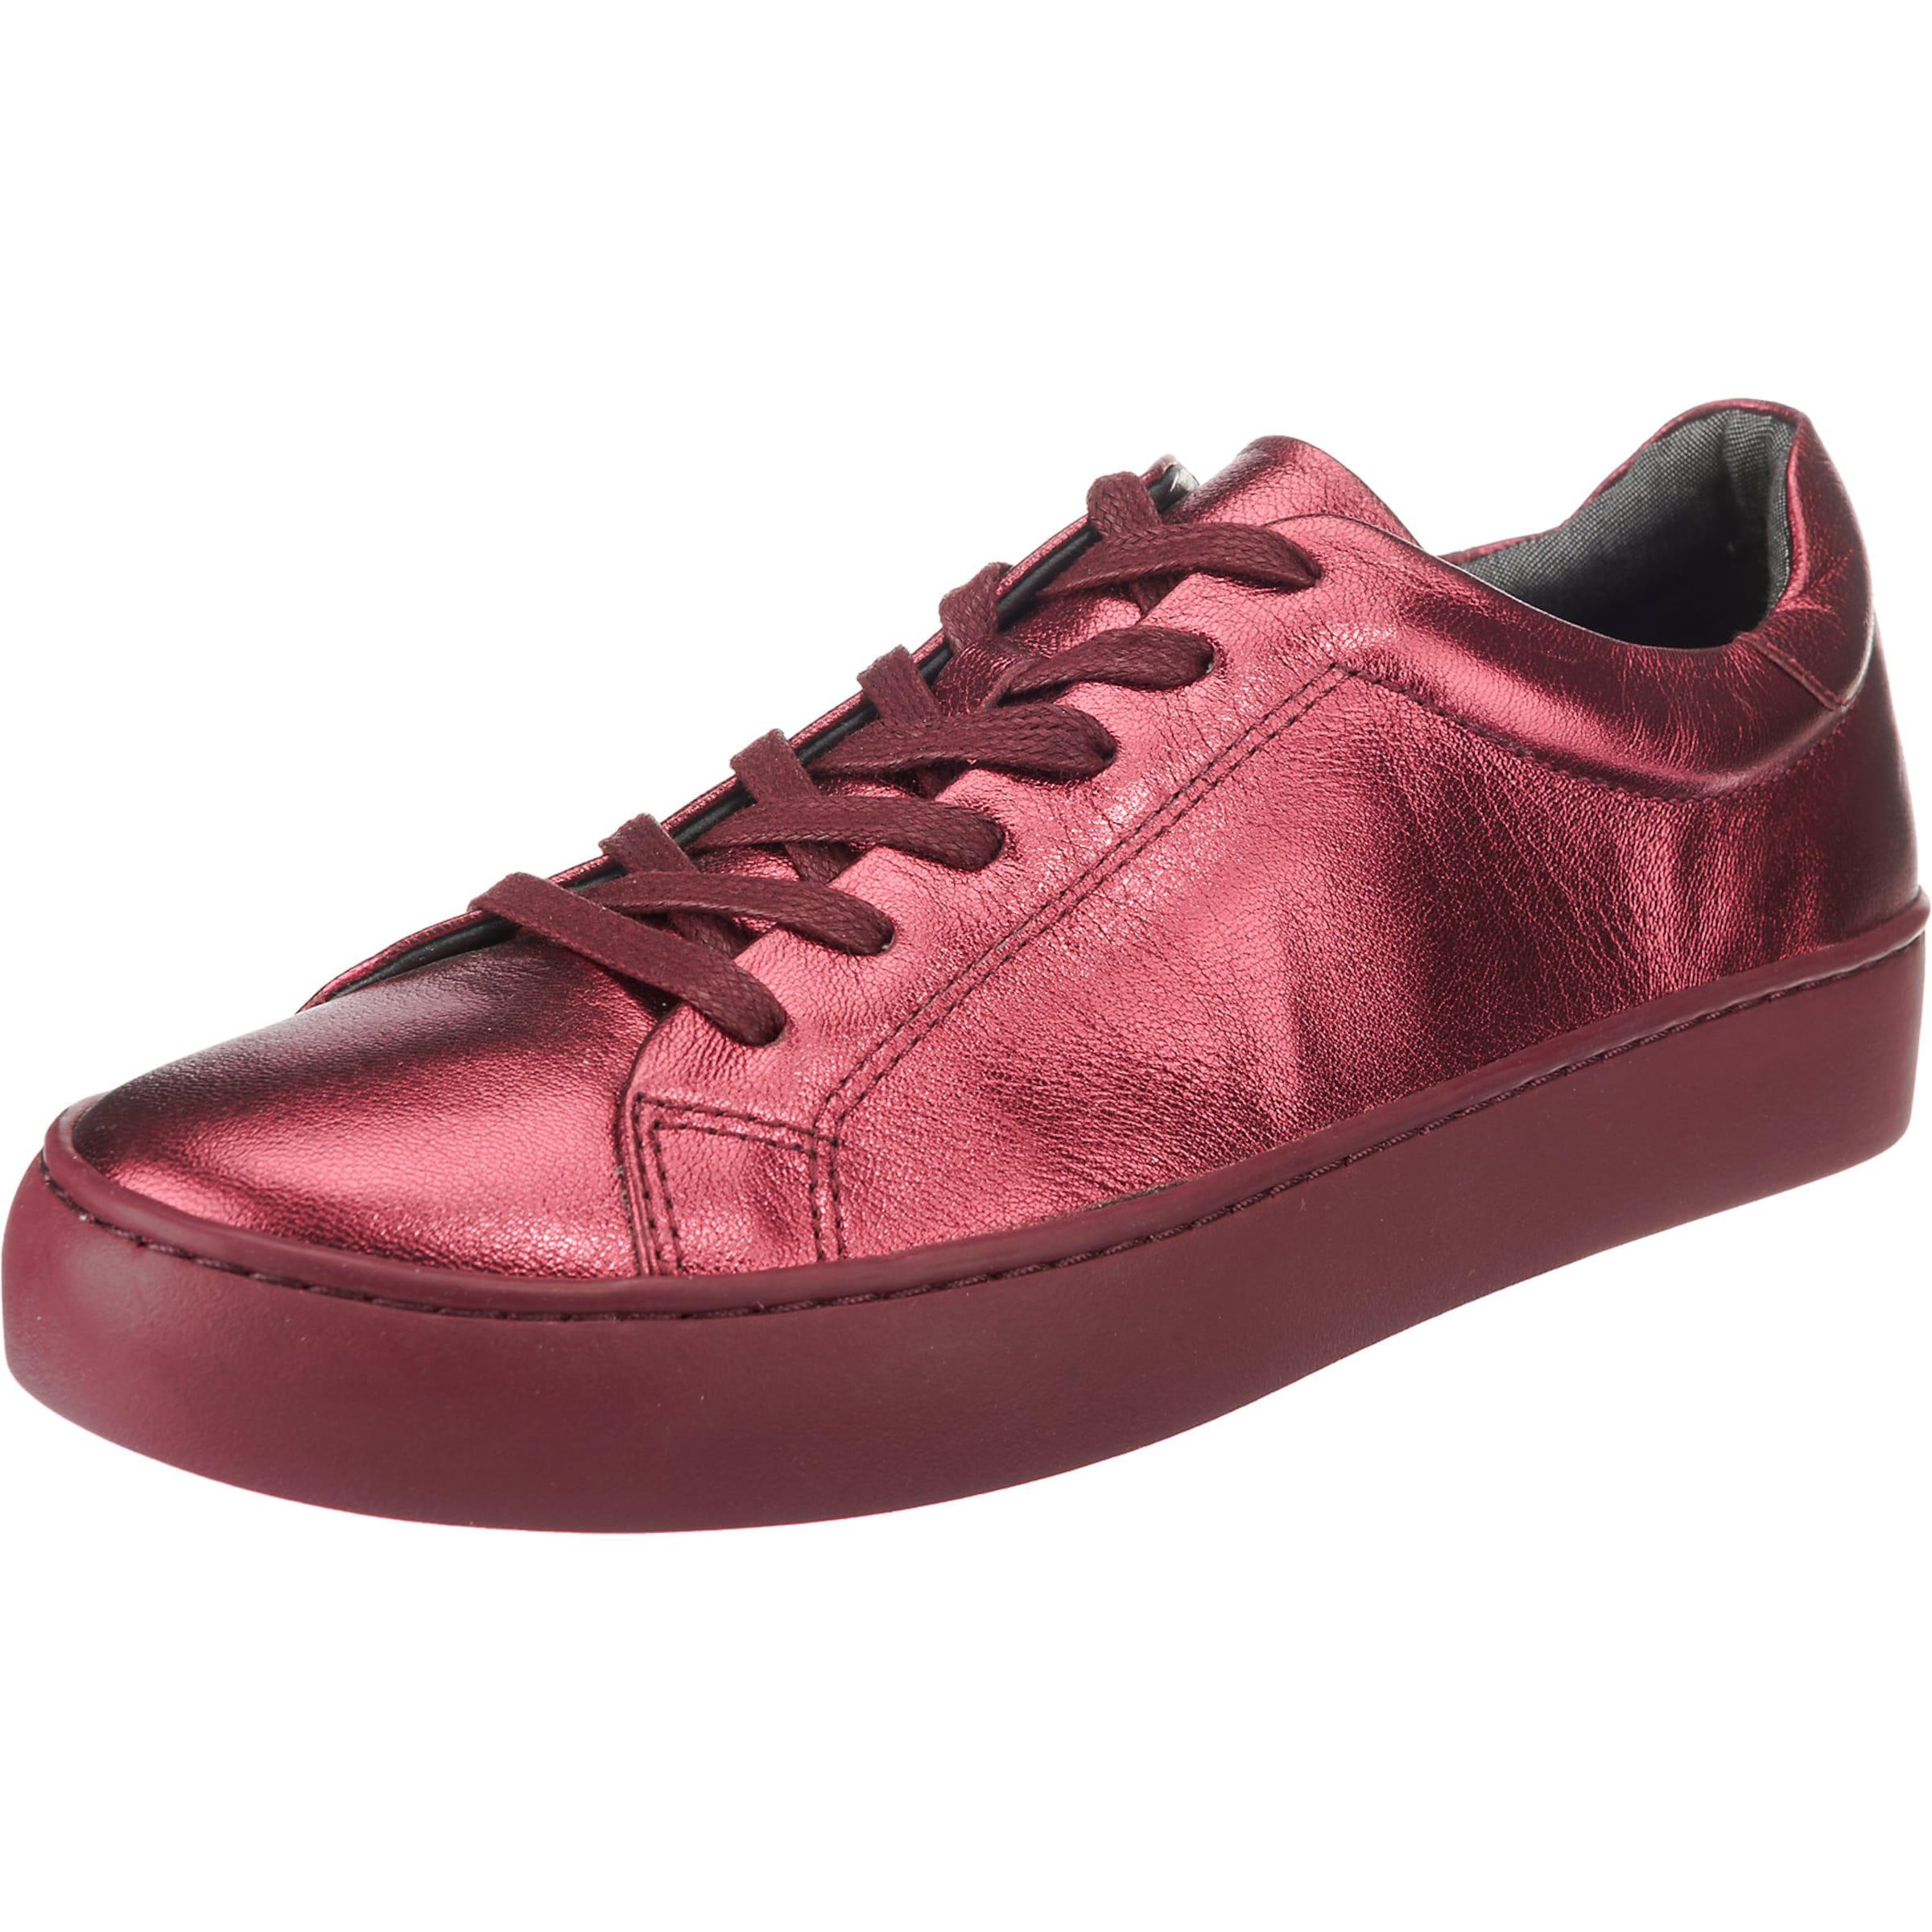 VAGABOND SHOEMAKERS Sneakers   Zoe